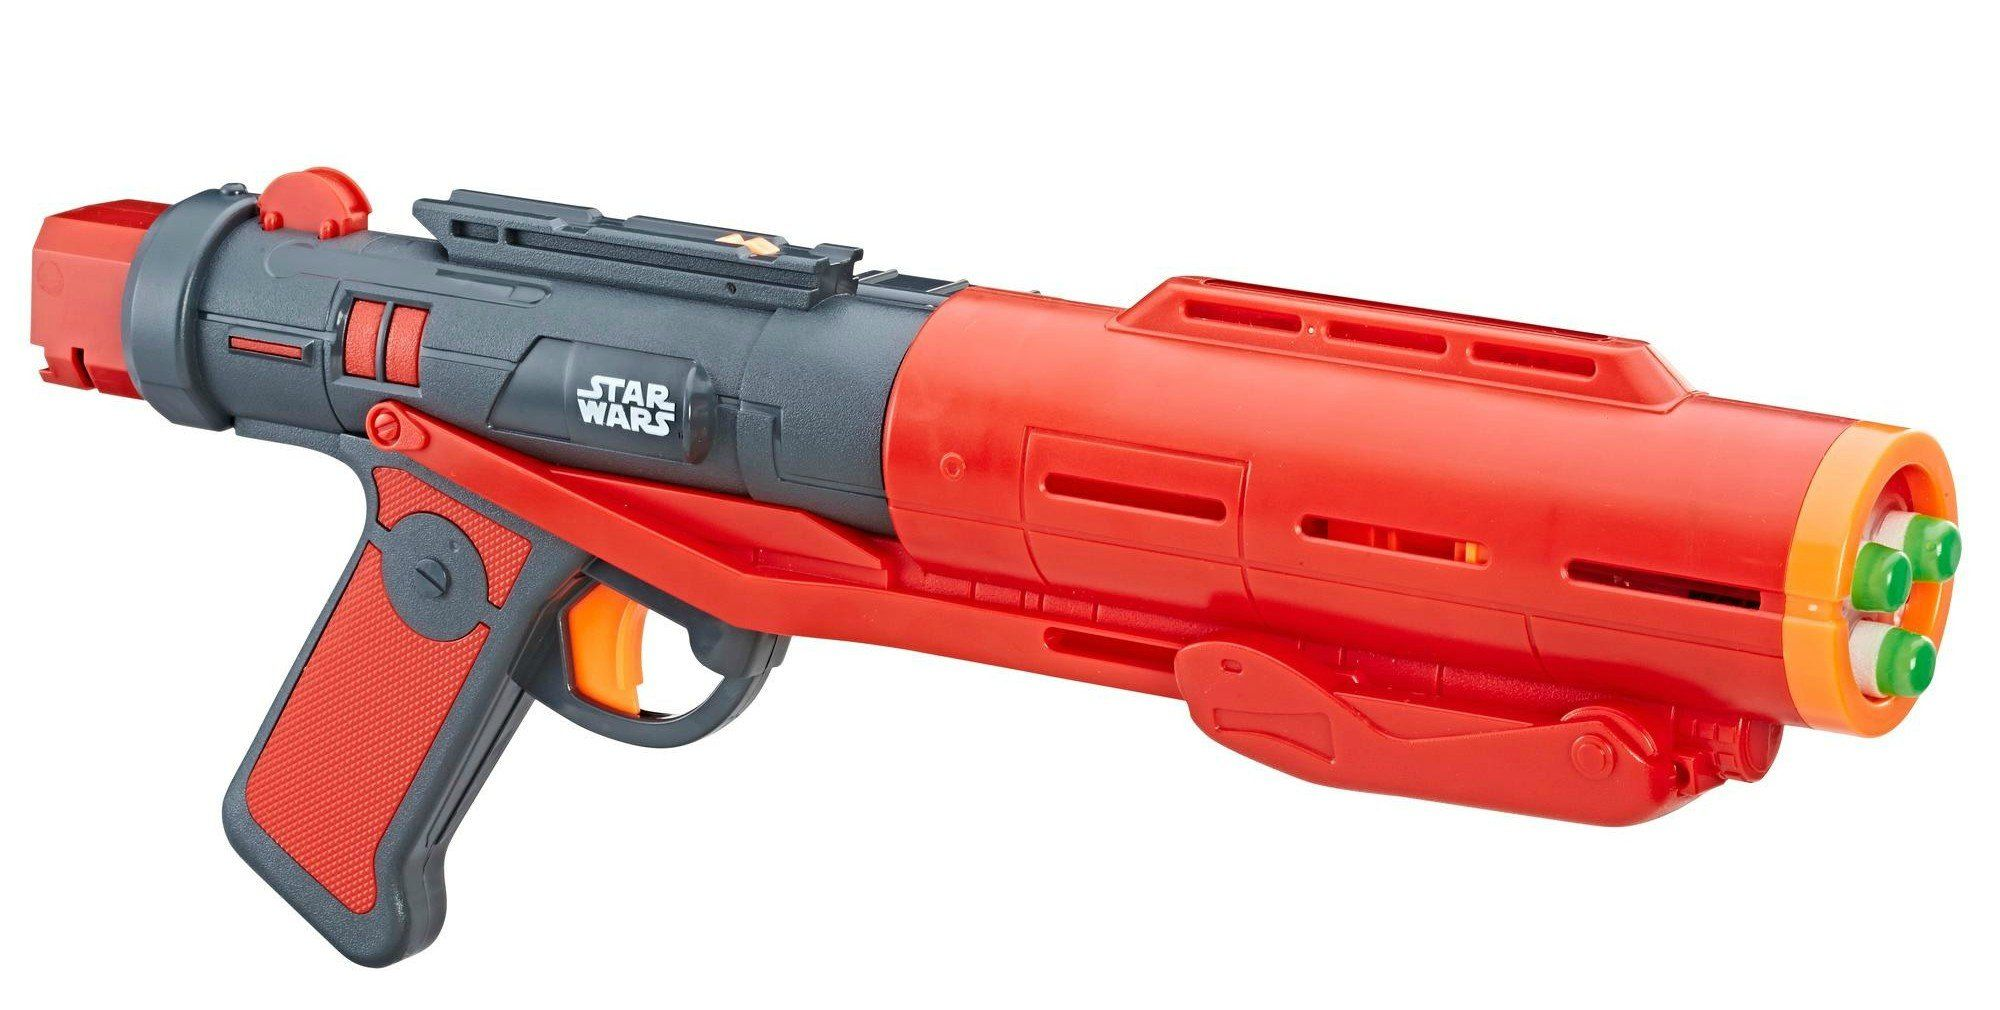 Nerf Glowstrike Star Wars (Lançador de Dardos) - Hasbro